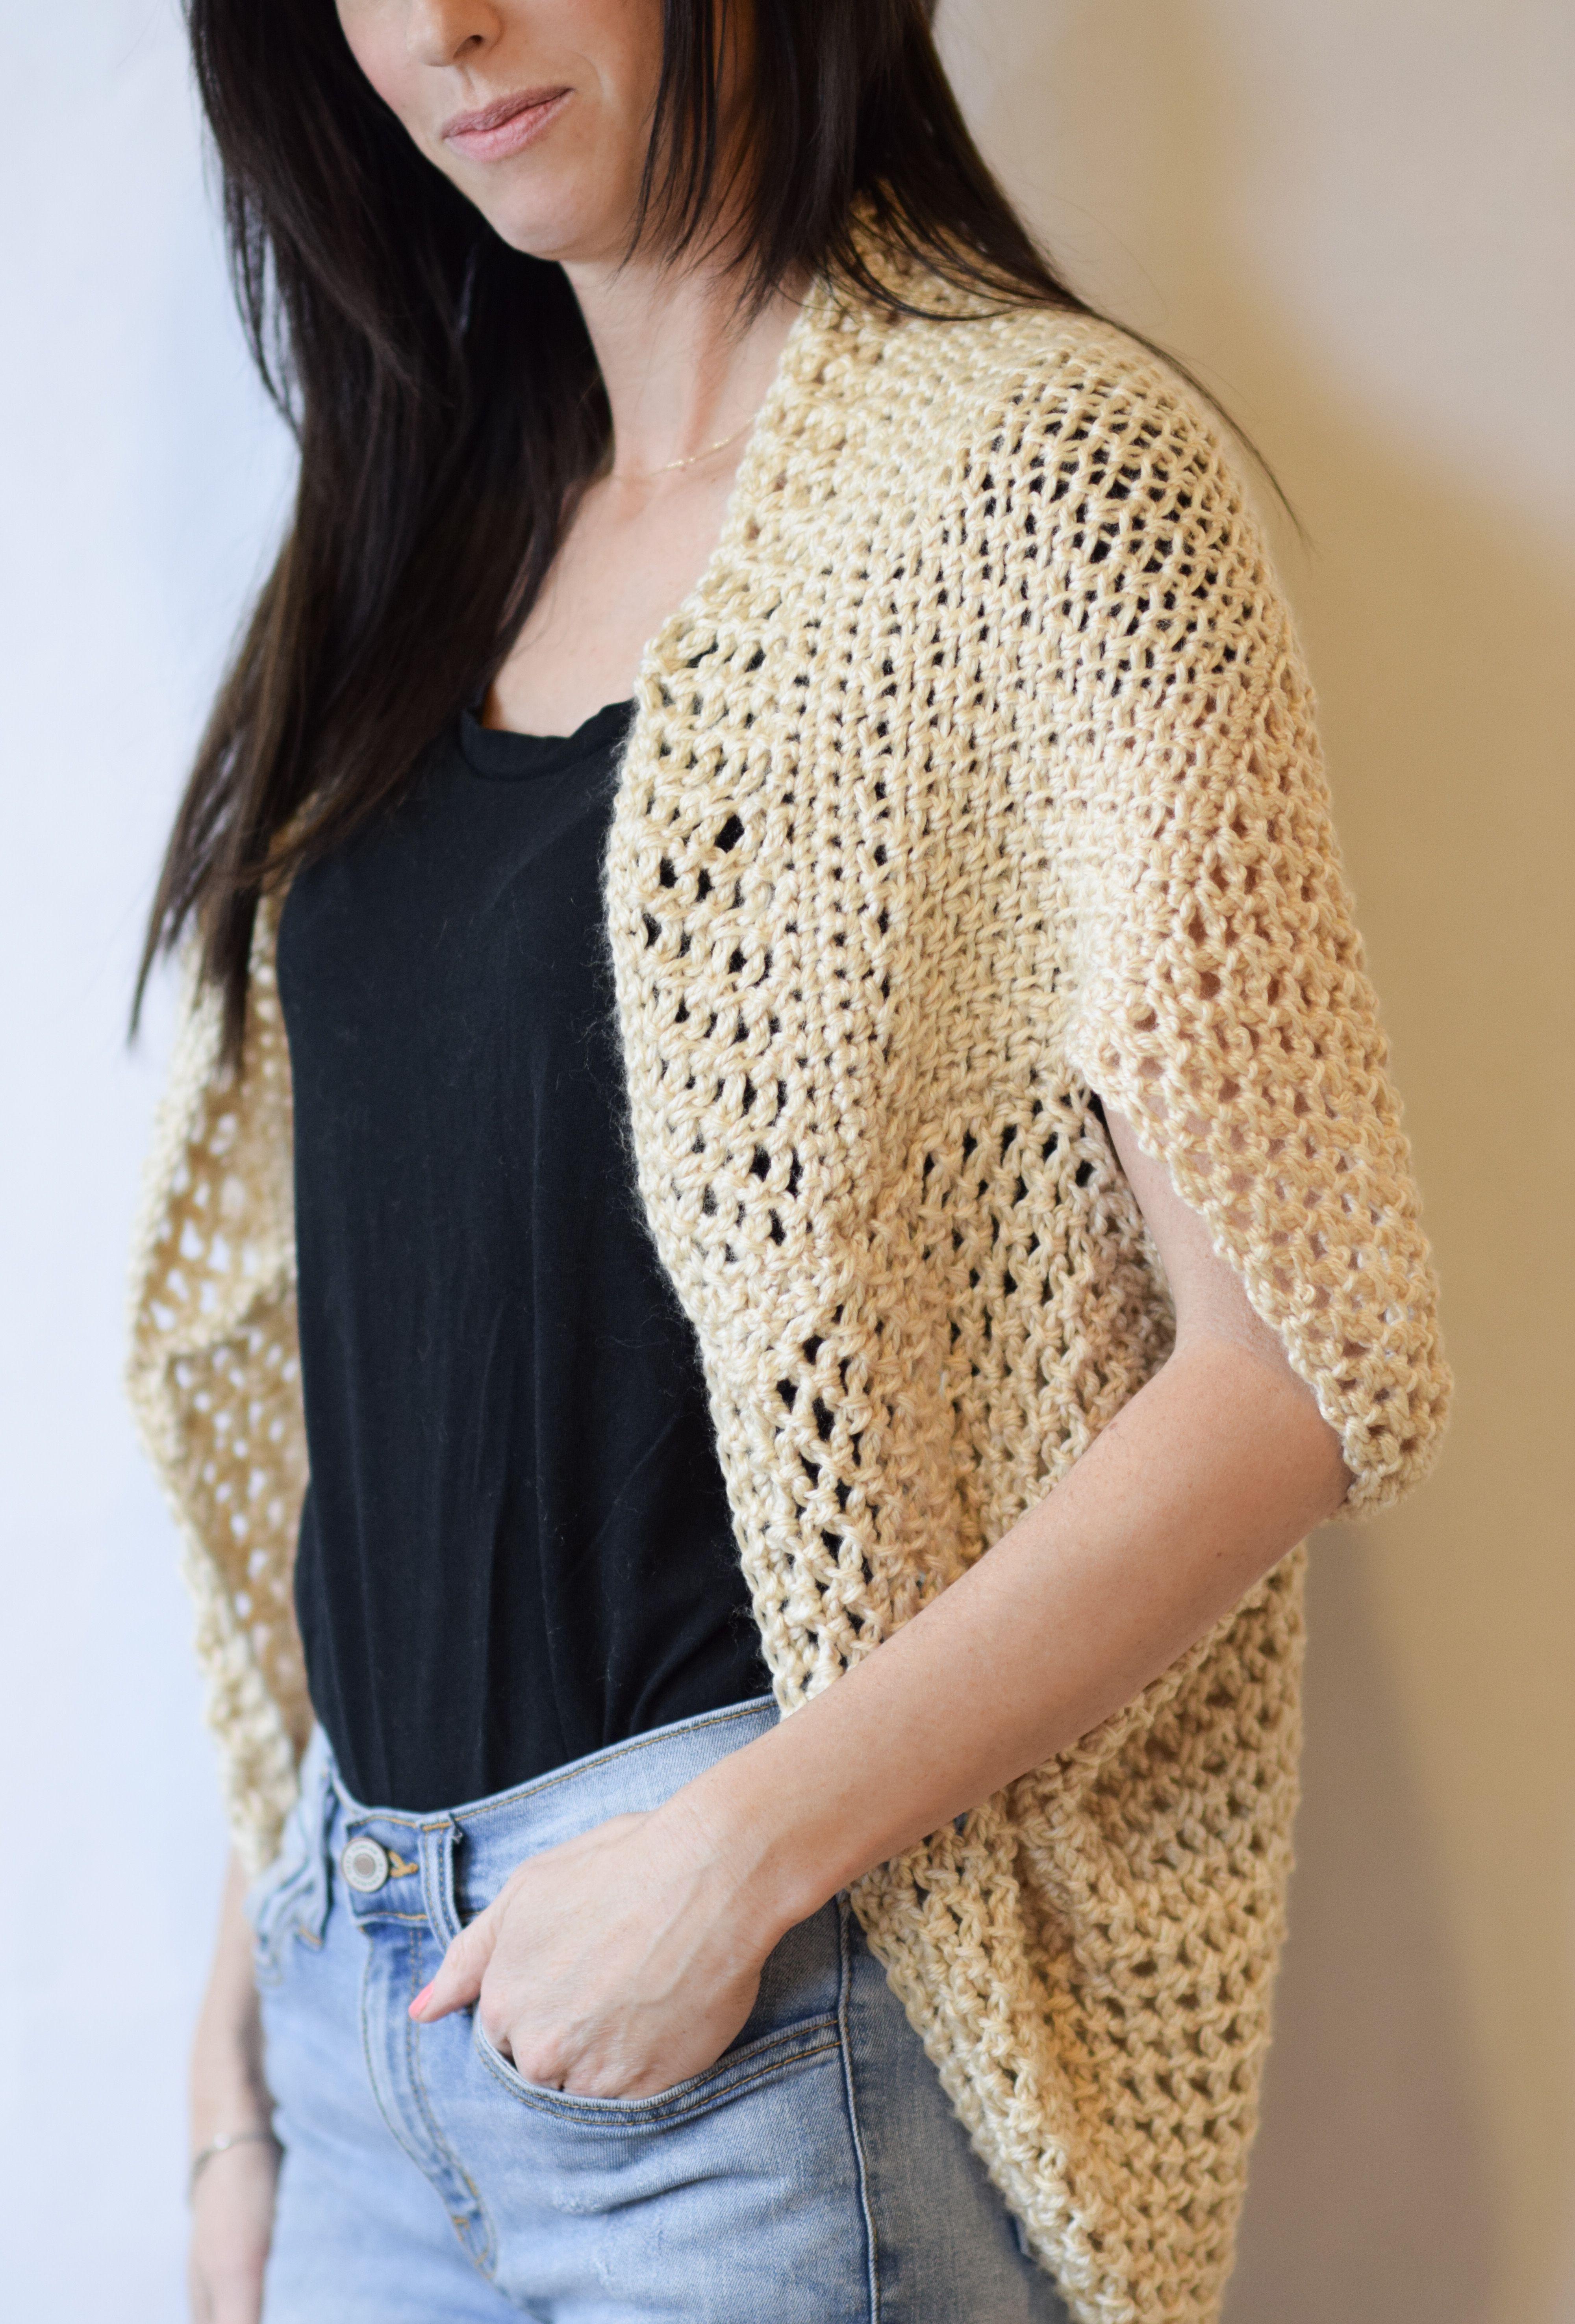 Mod Mesh Honey Blanket Sweater | Pinterest | Häkeln